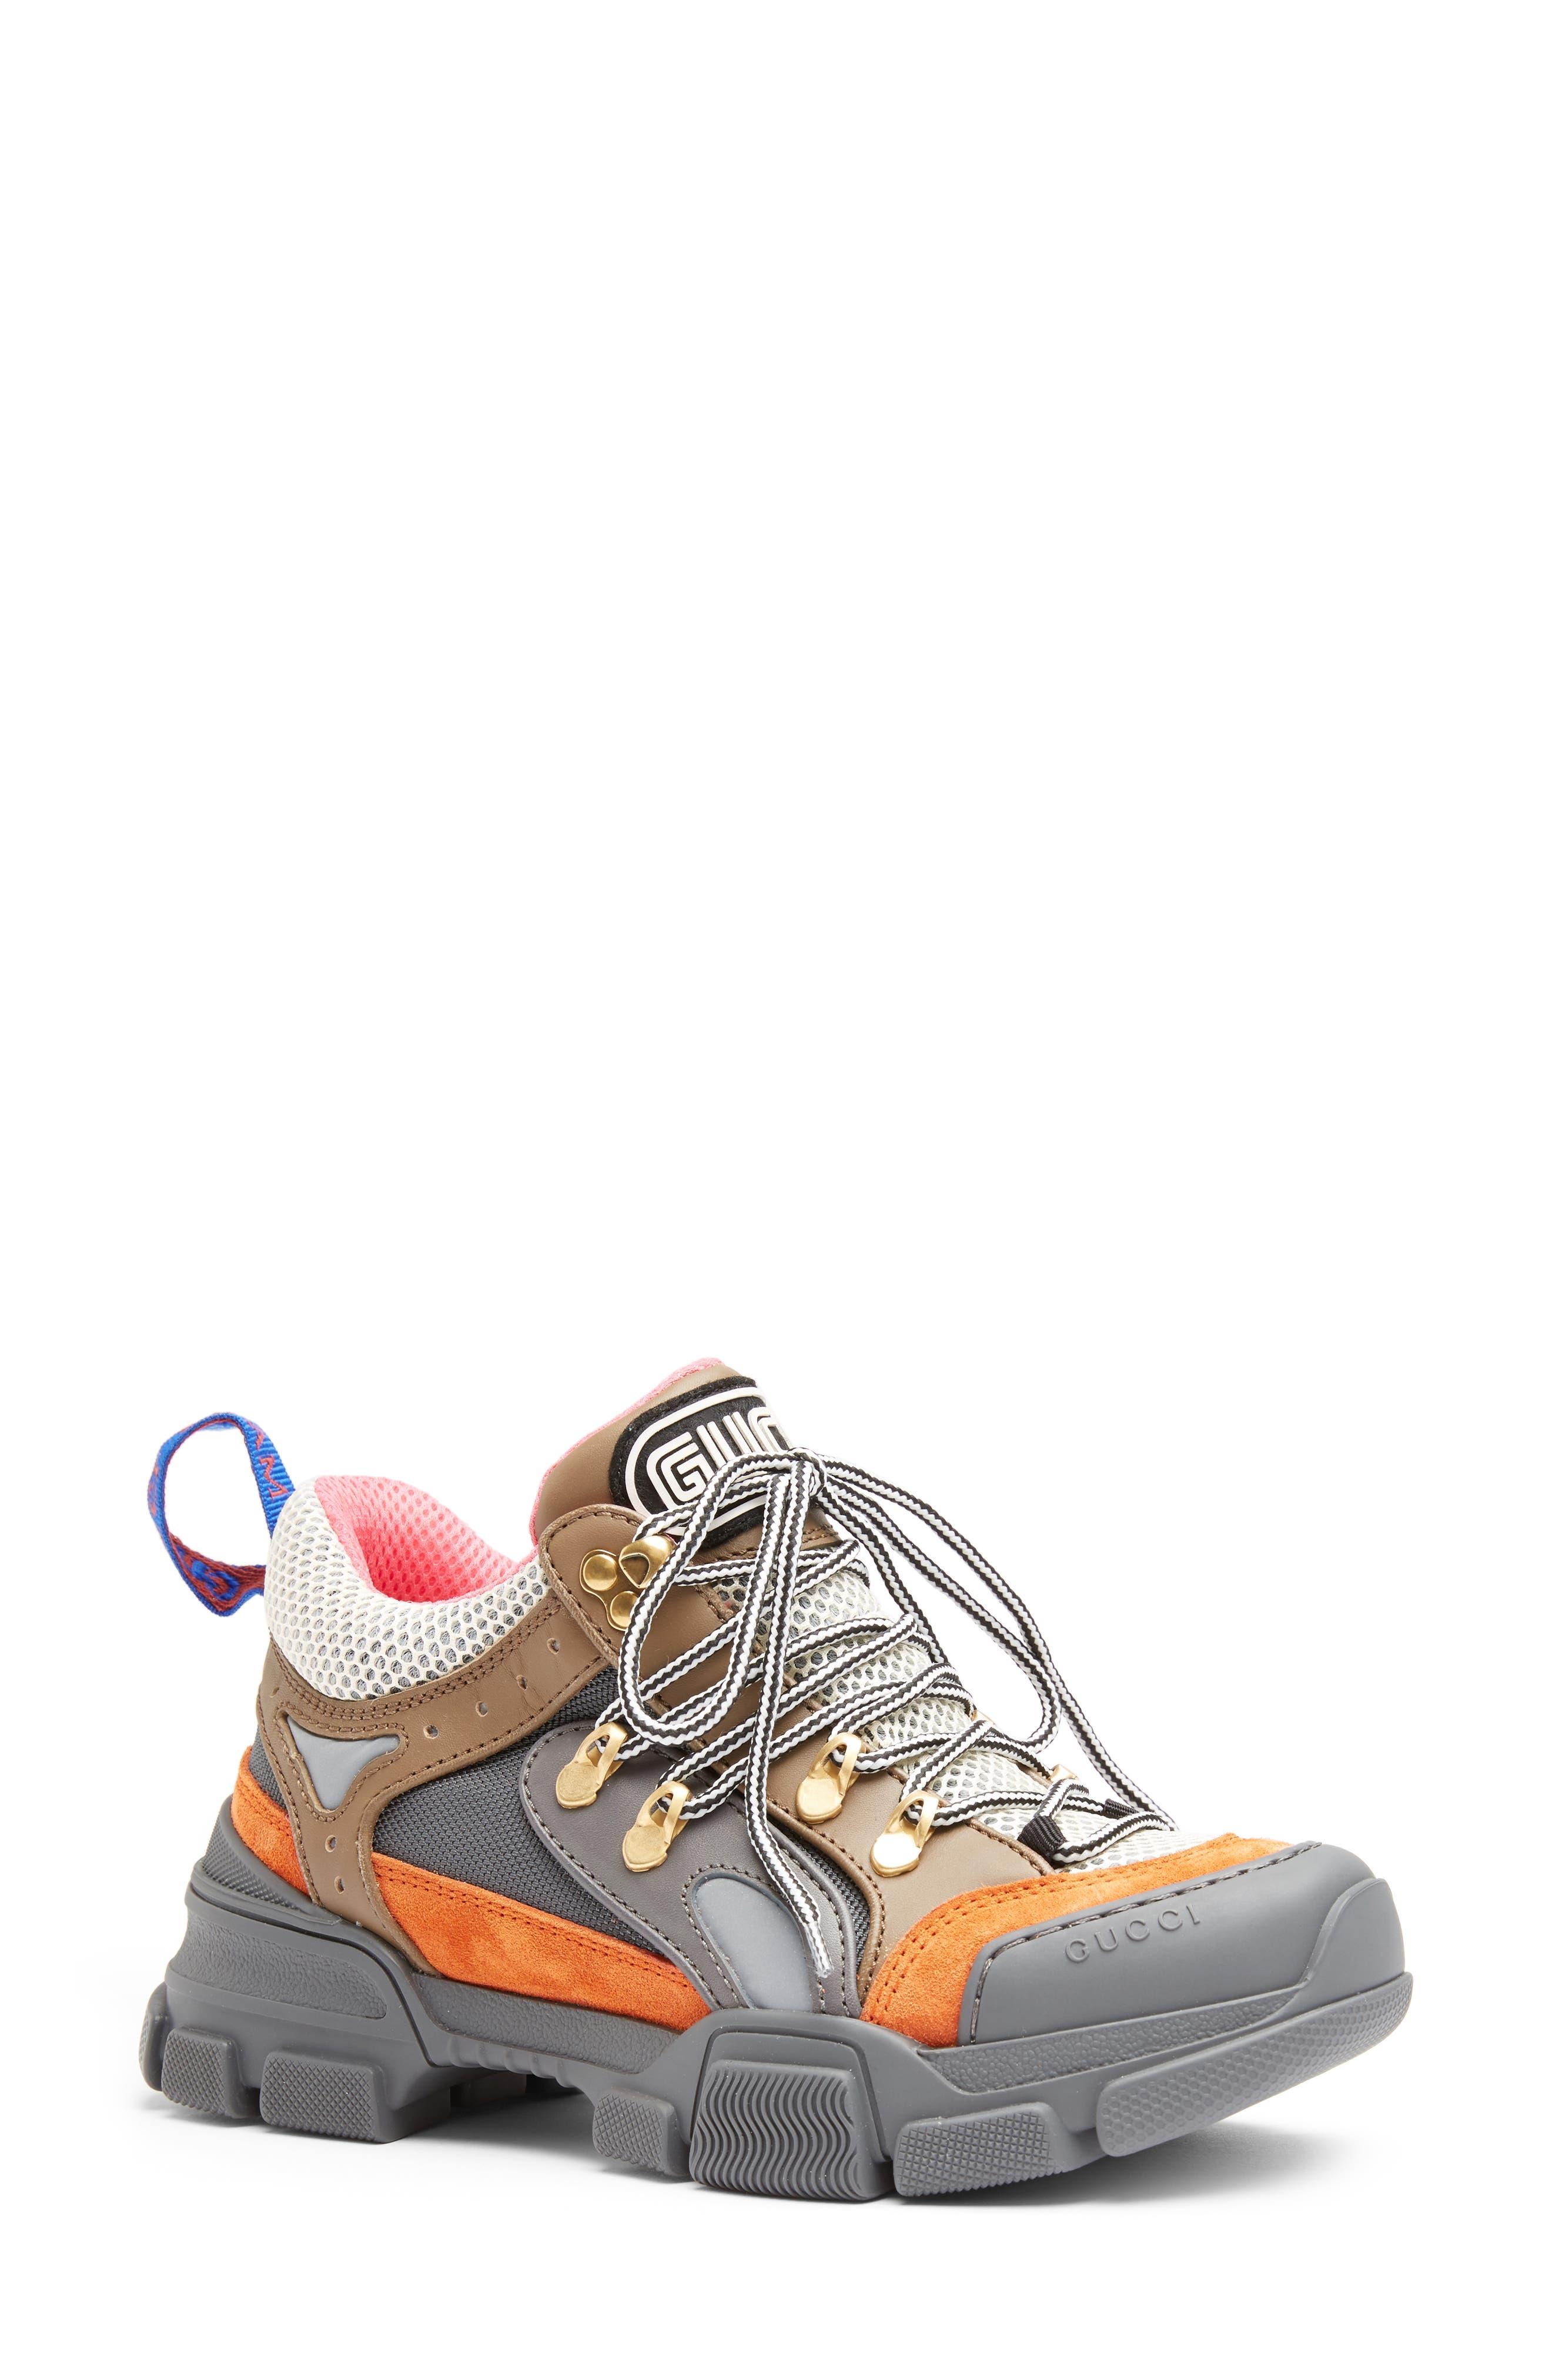 Journey Sneaker,                         Main,                         color, GREY/ ORANGE